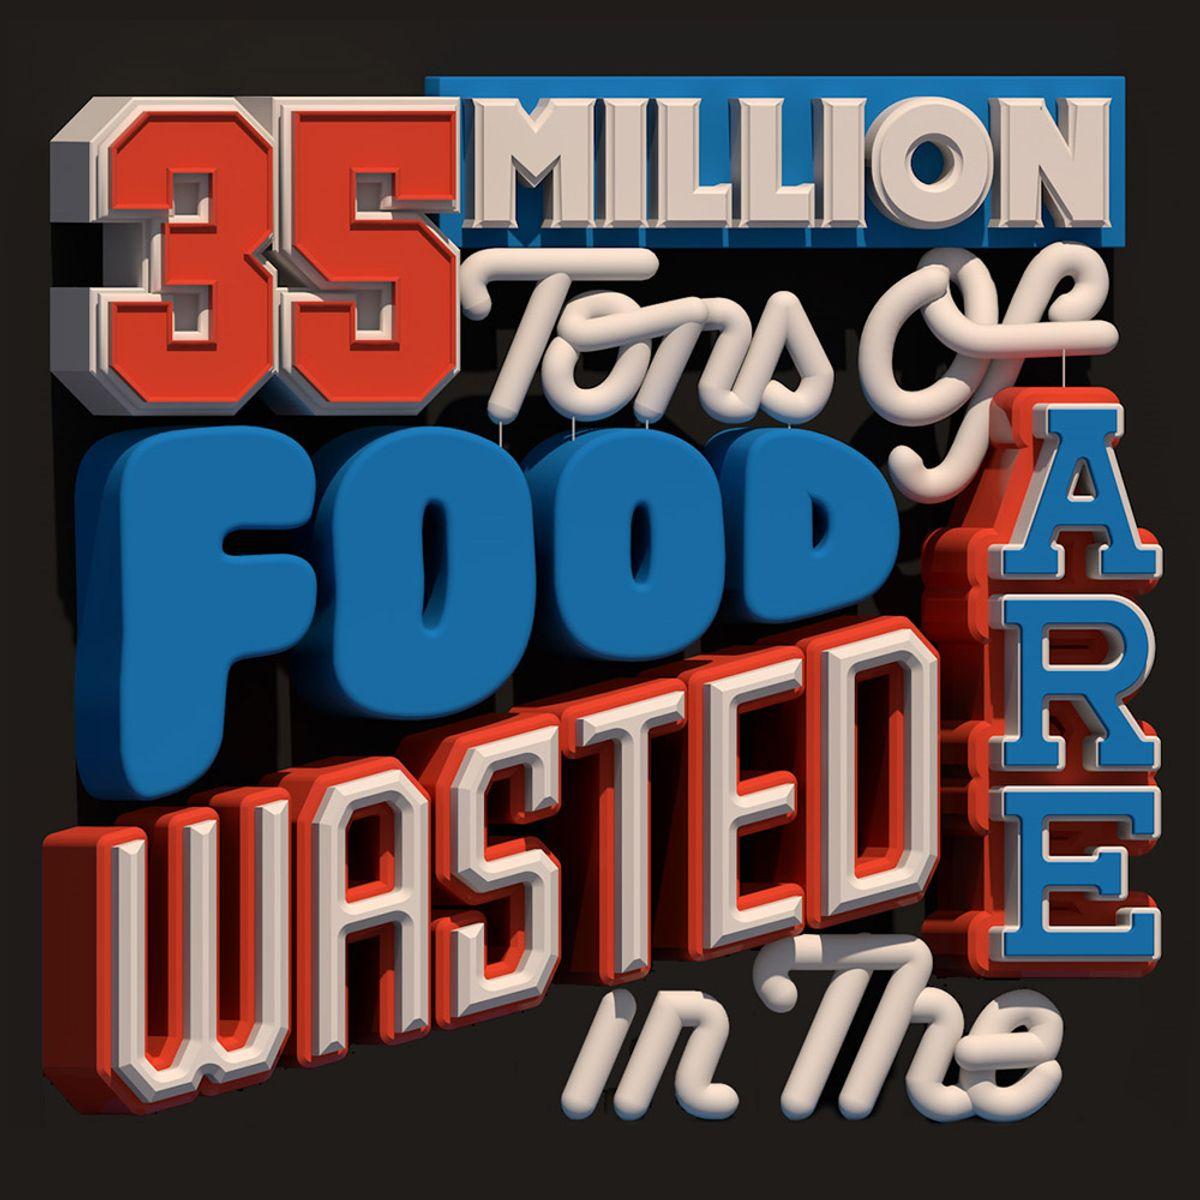 171217 ARTC 4305 Holt P1: Food Waste Poster